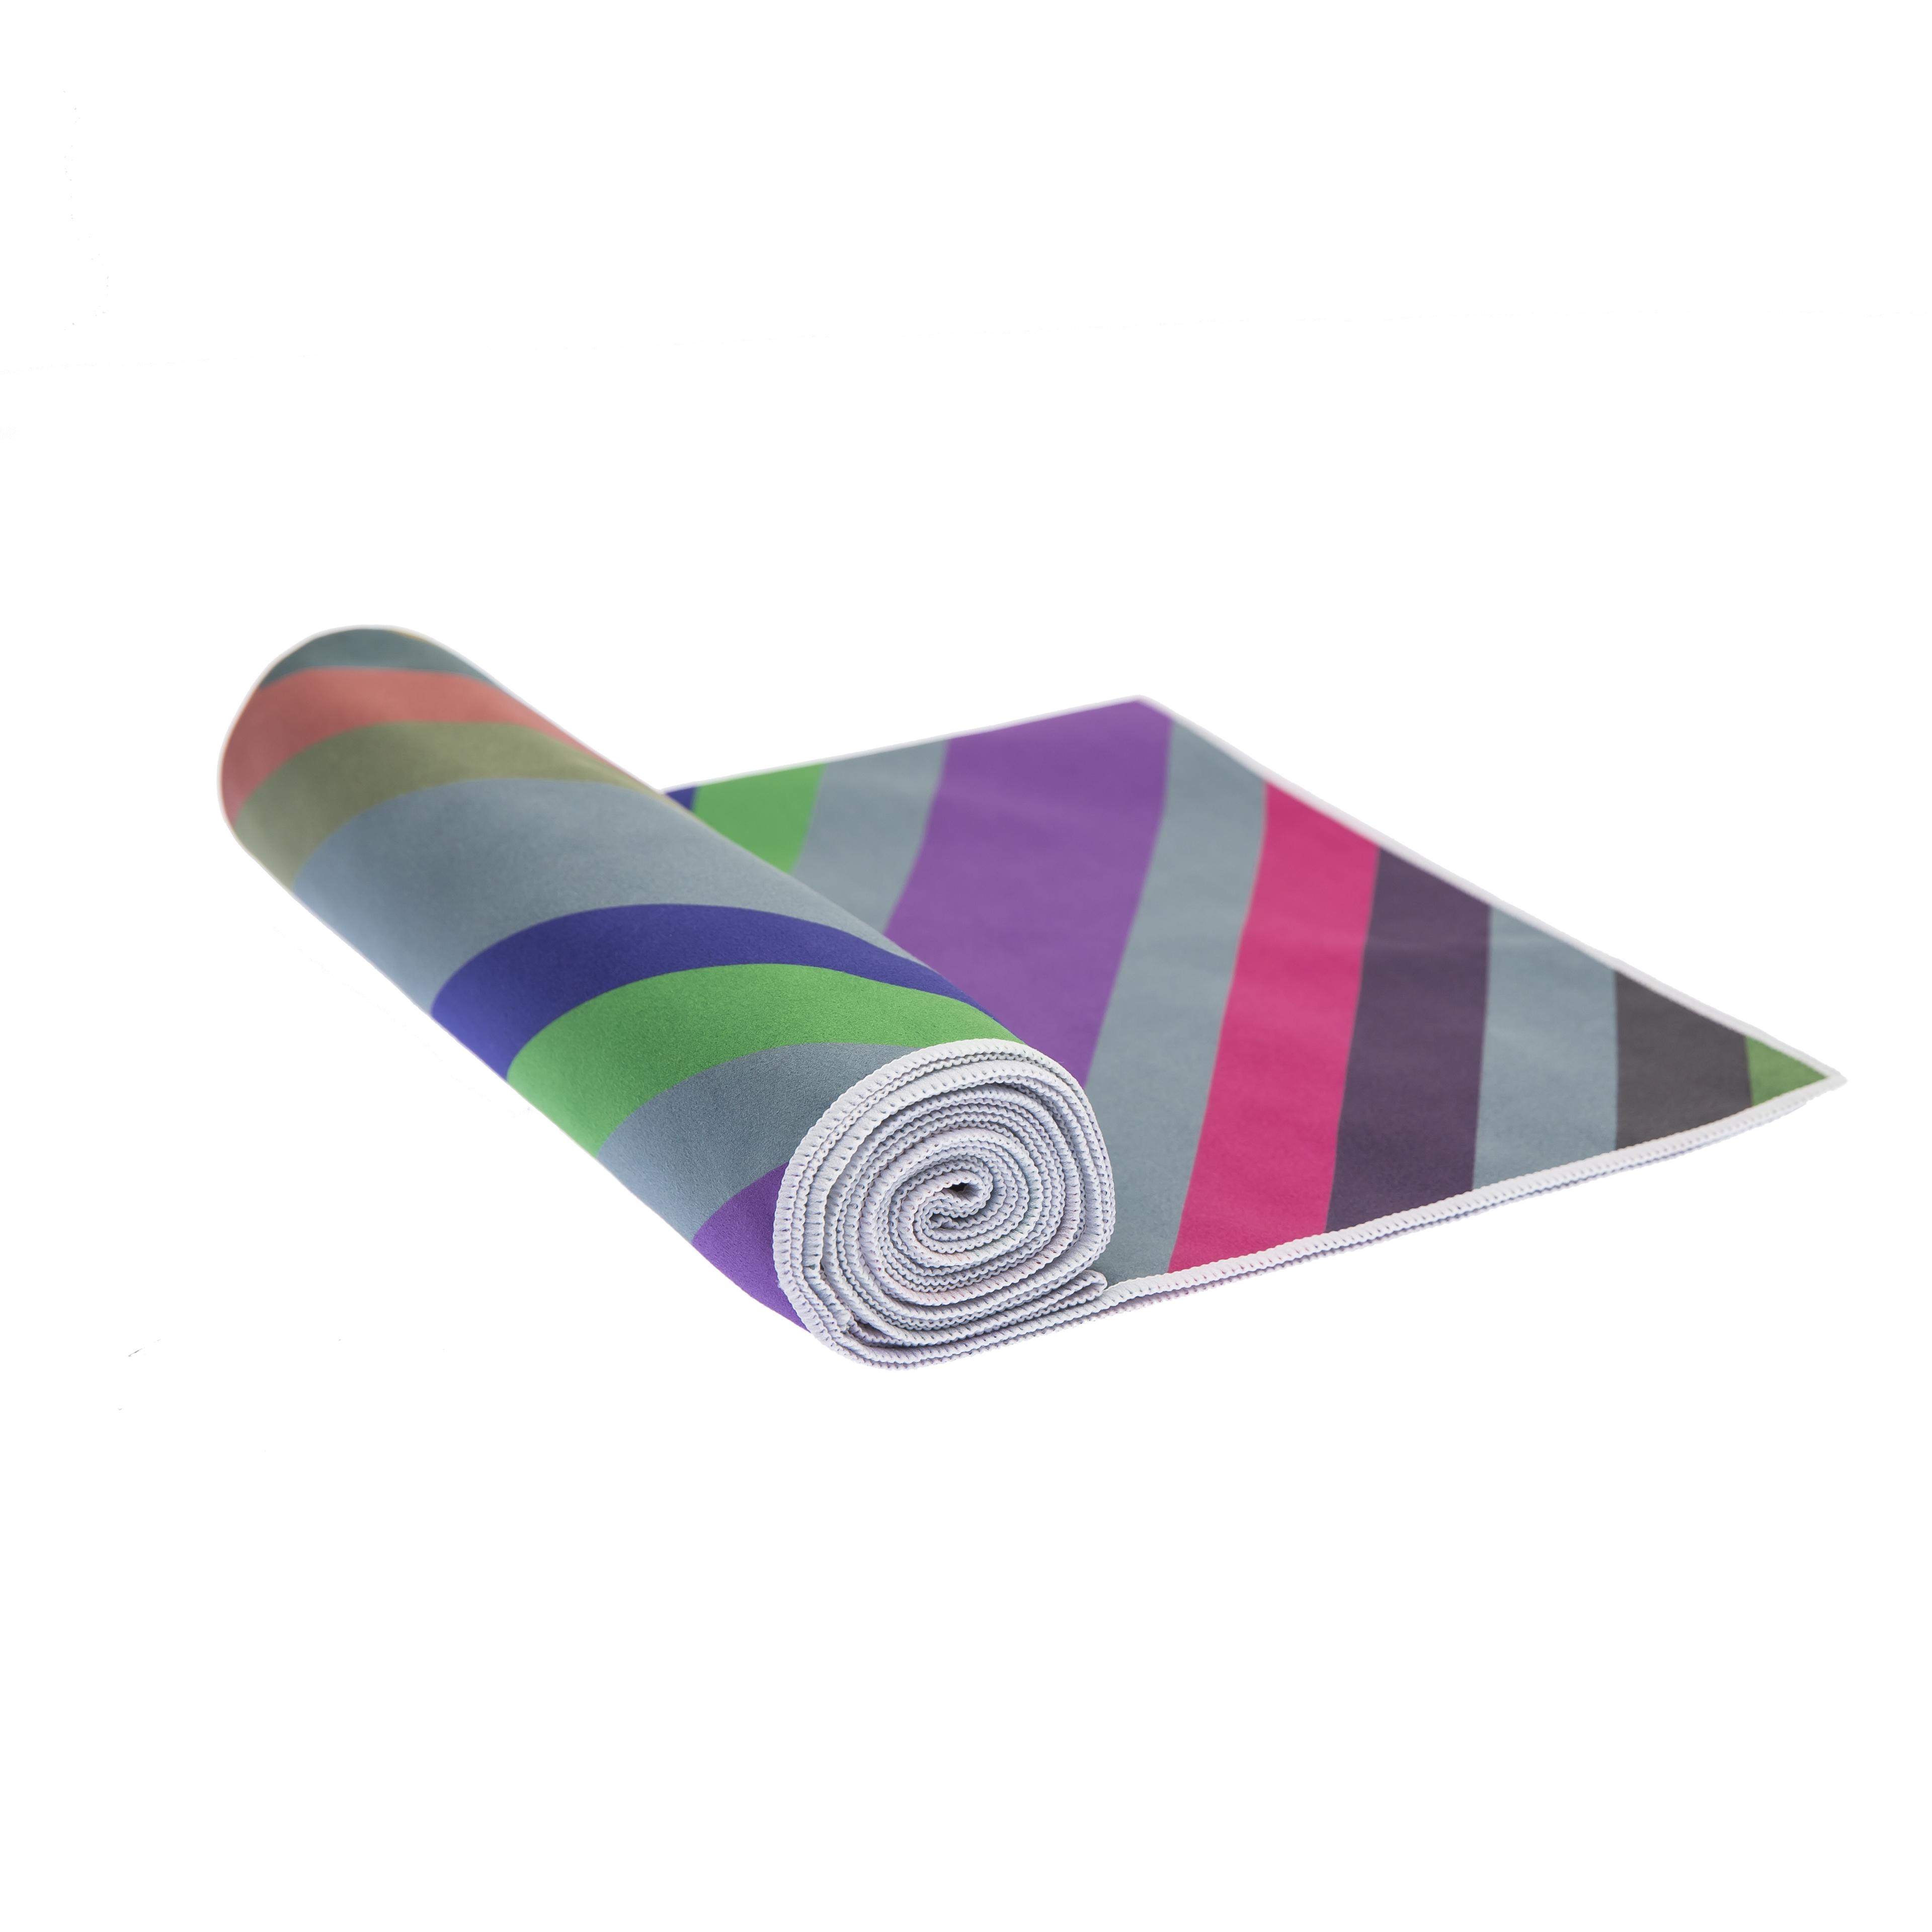 sahara printed mat towels yoga microfiber products towel mats folded cover